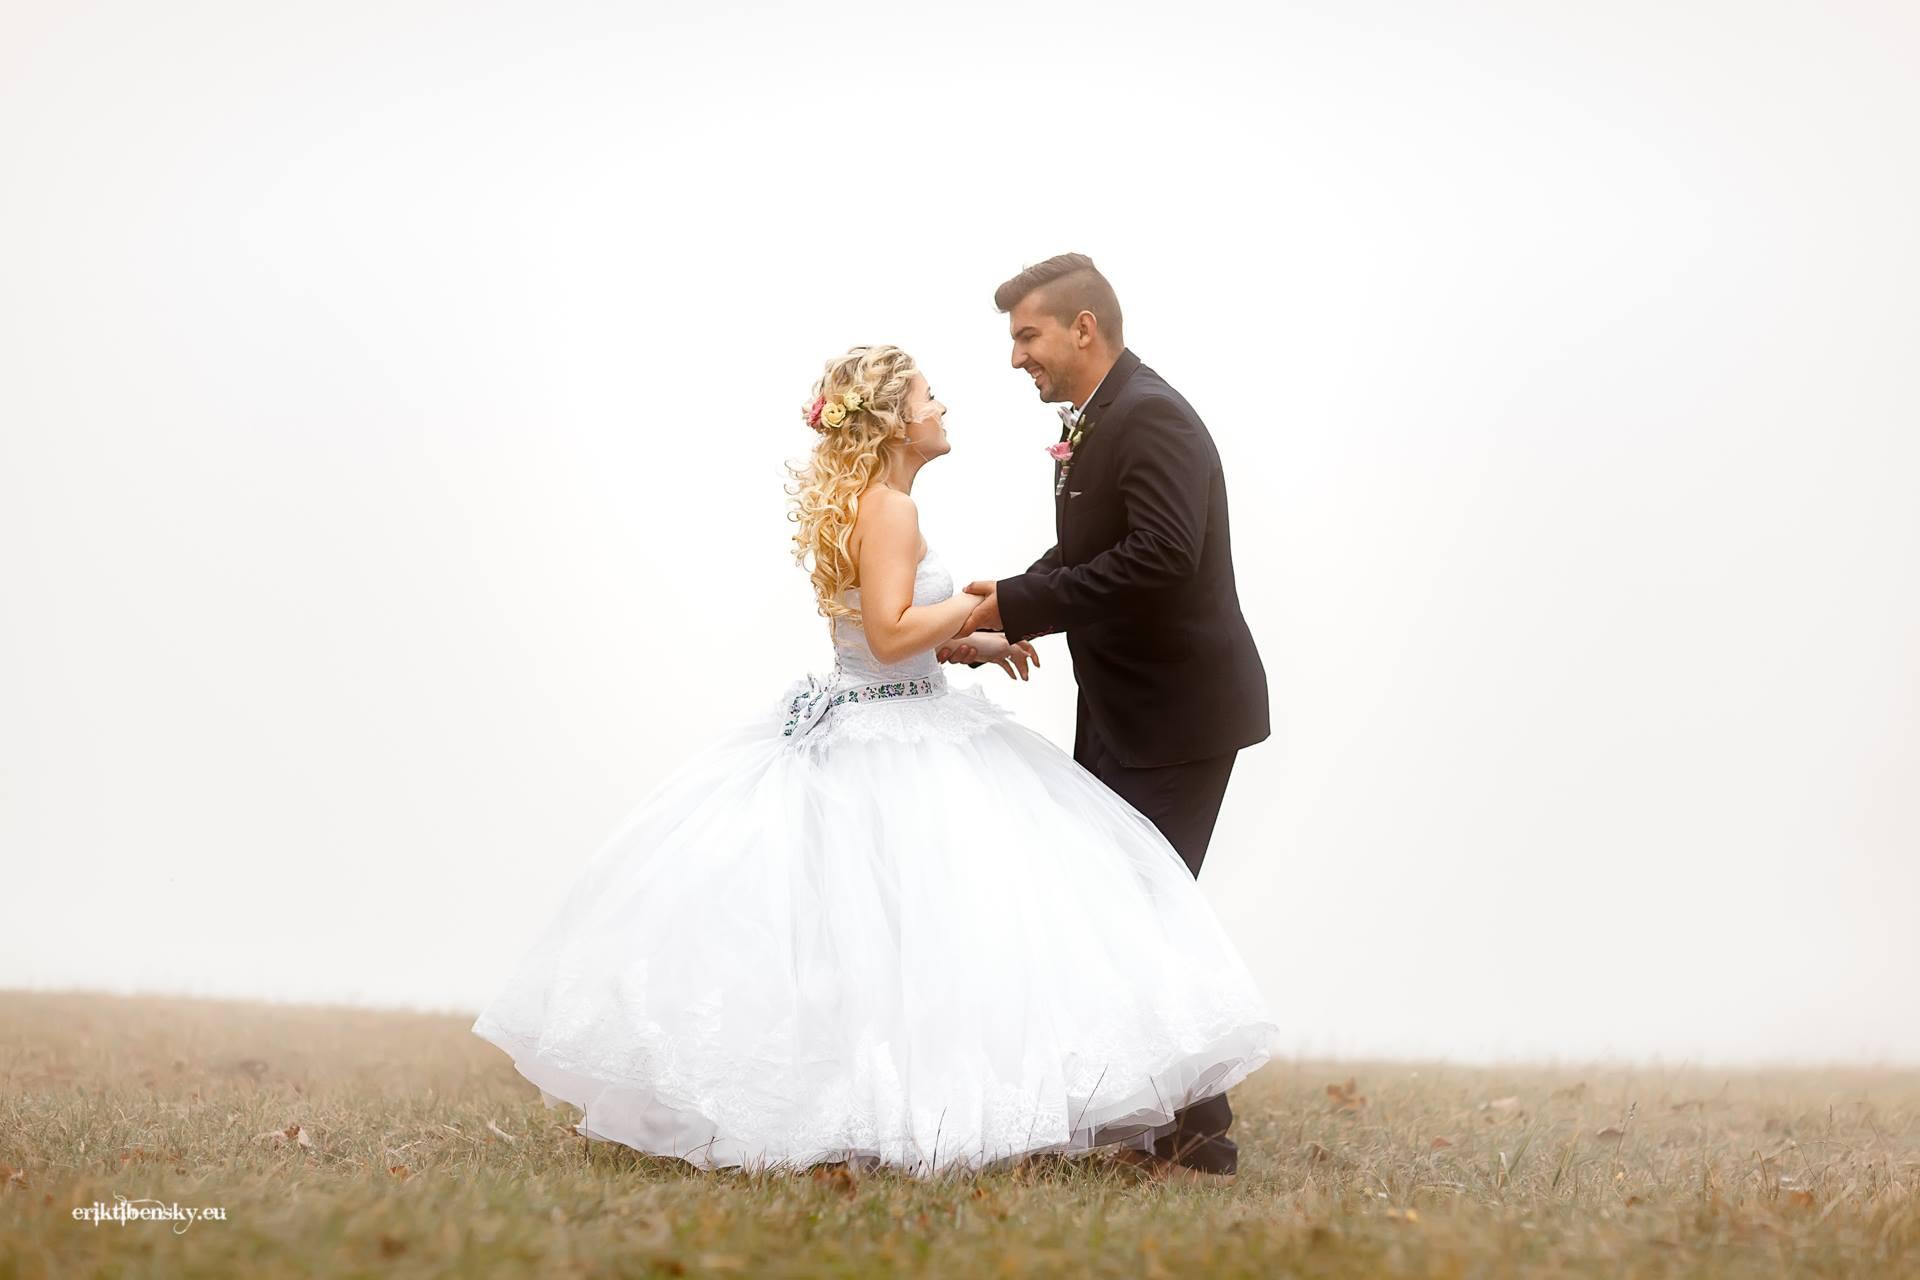 eriktibensky-eu-fotograf-wedding-photo-svadba-svadobny-pezinok-bratislava-modra-senec-1008